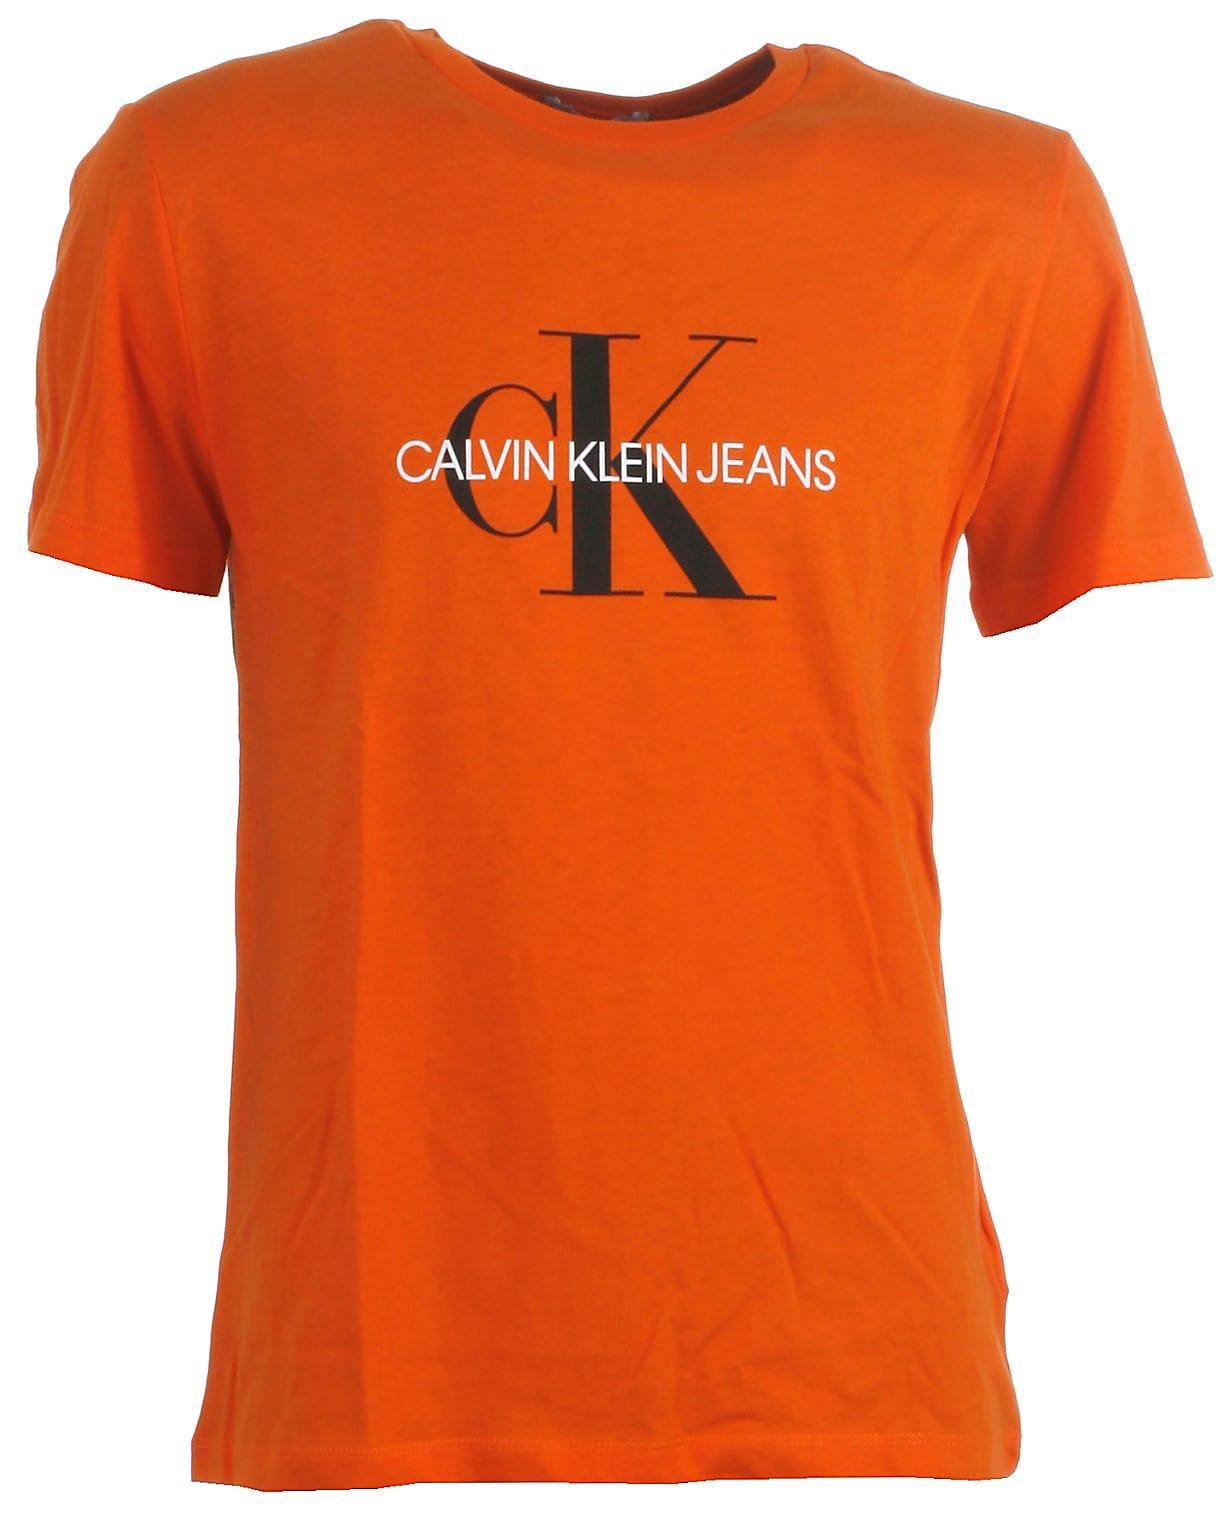 Calvin Klein t shirt ss, Monogram, orange